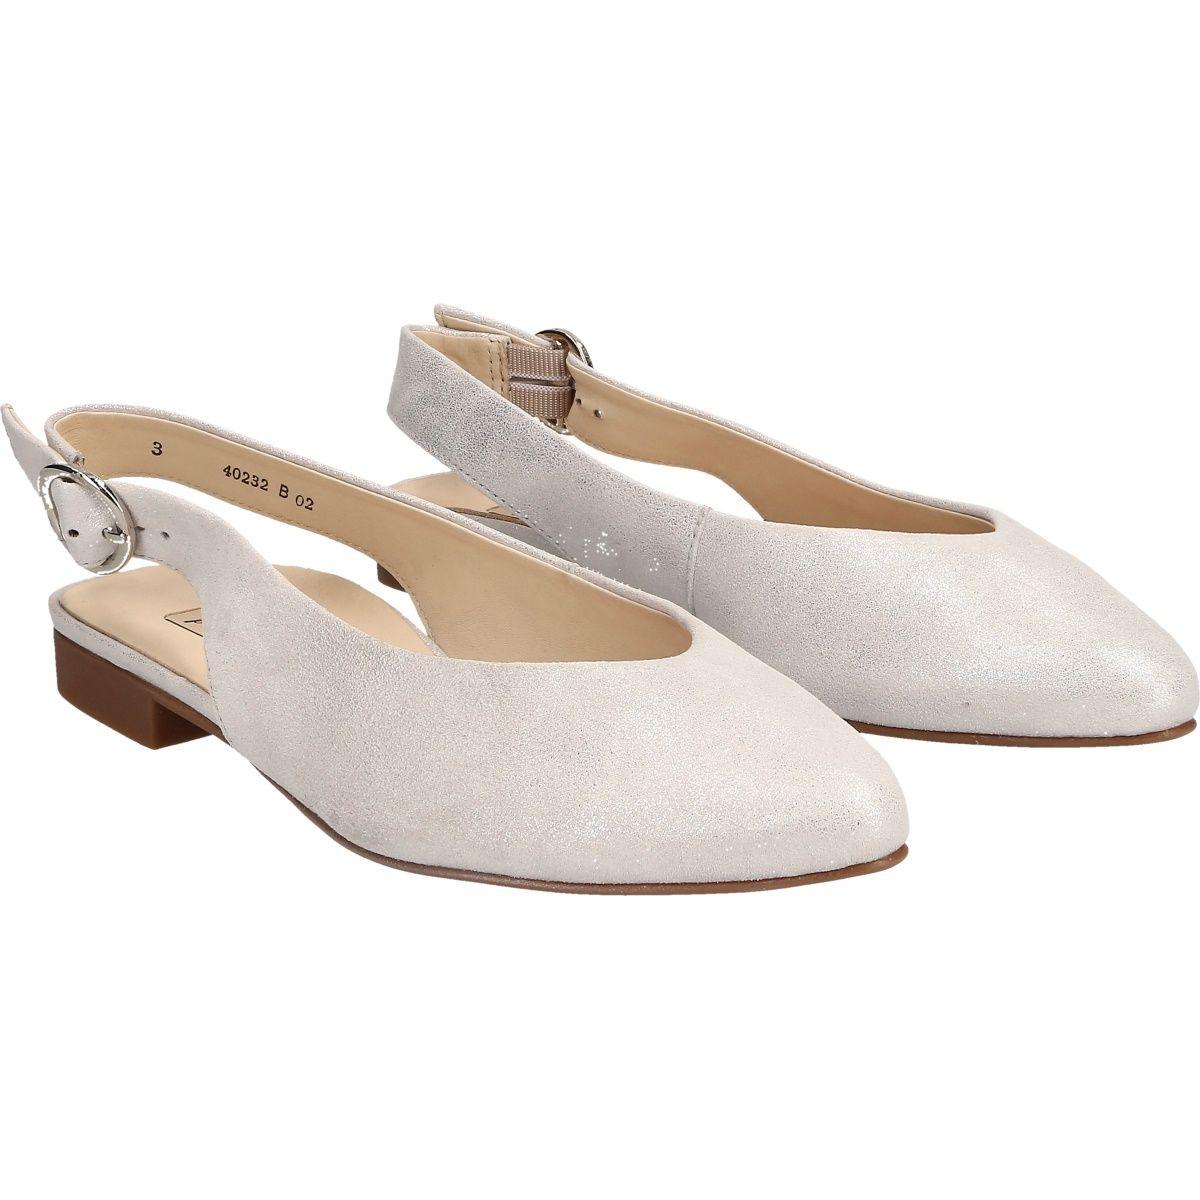 Paul Green 7461 014 Women's shoes Peeptoes & Slingpumps buy